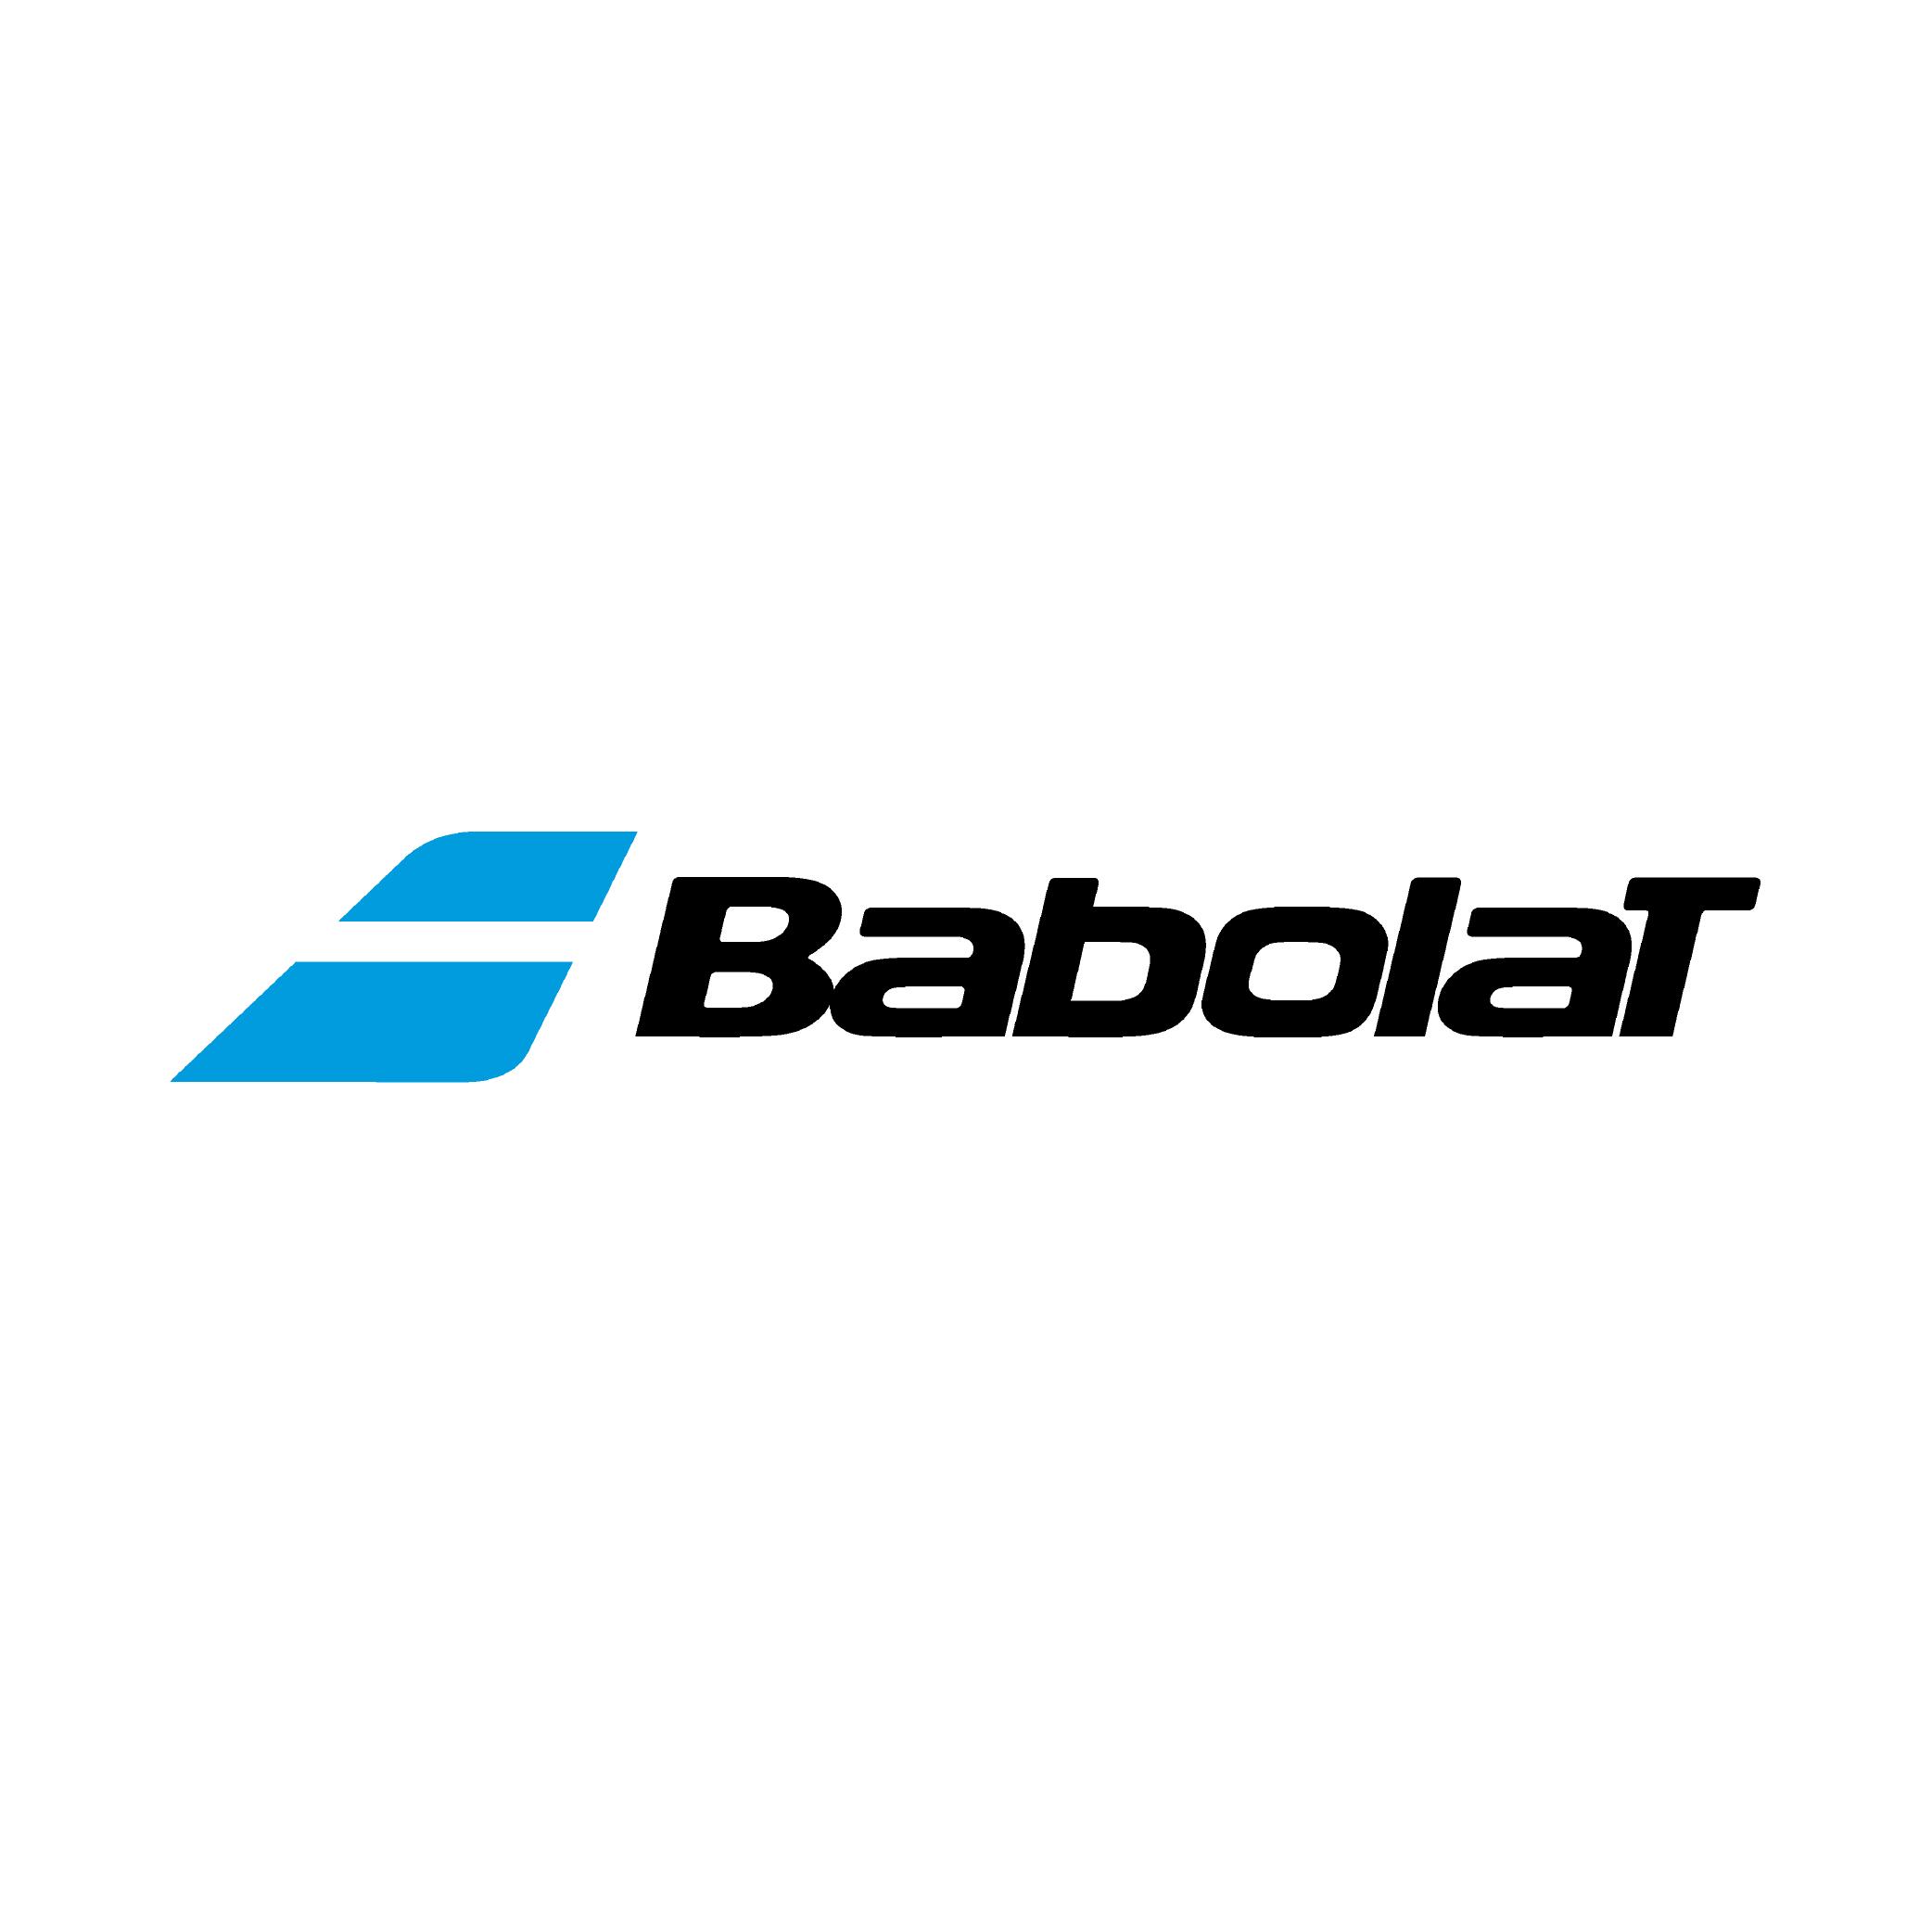 Babolat-01.png